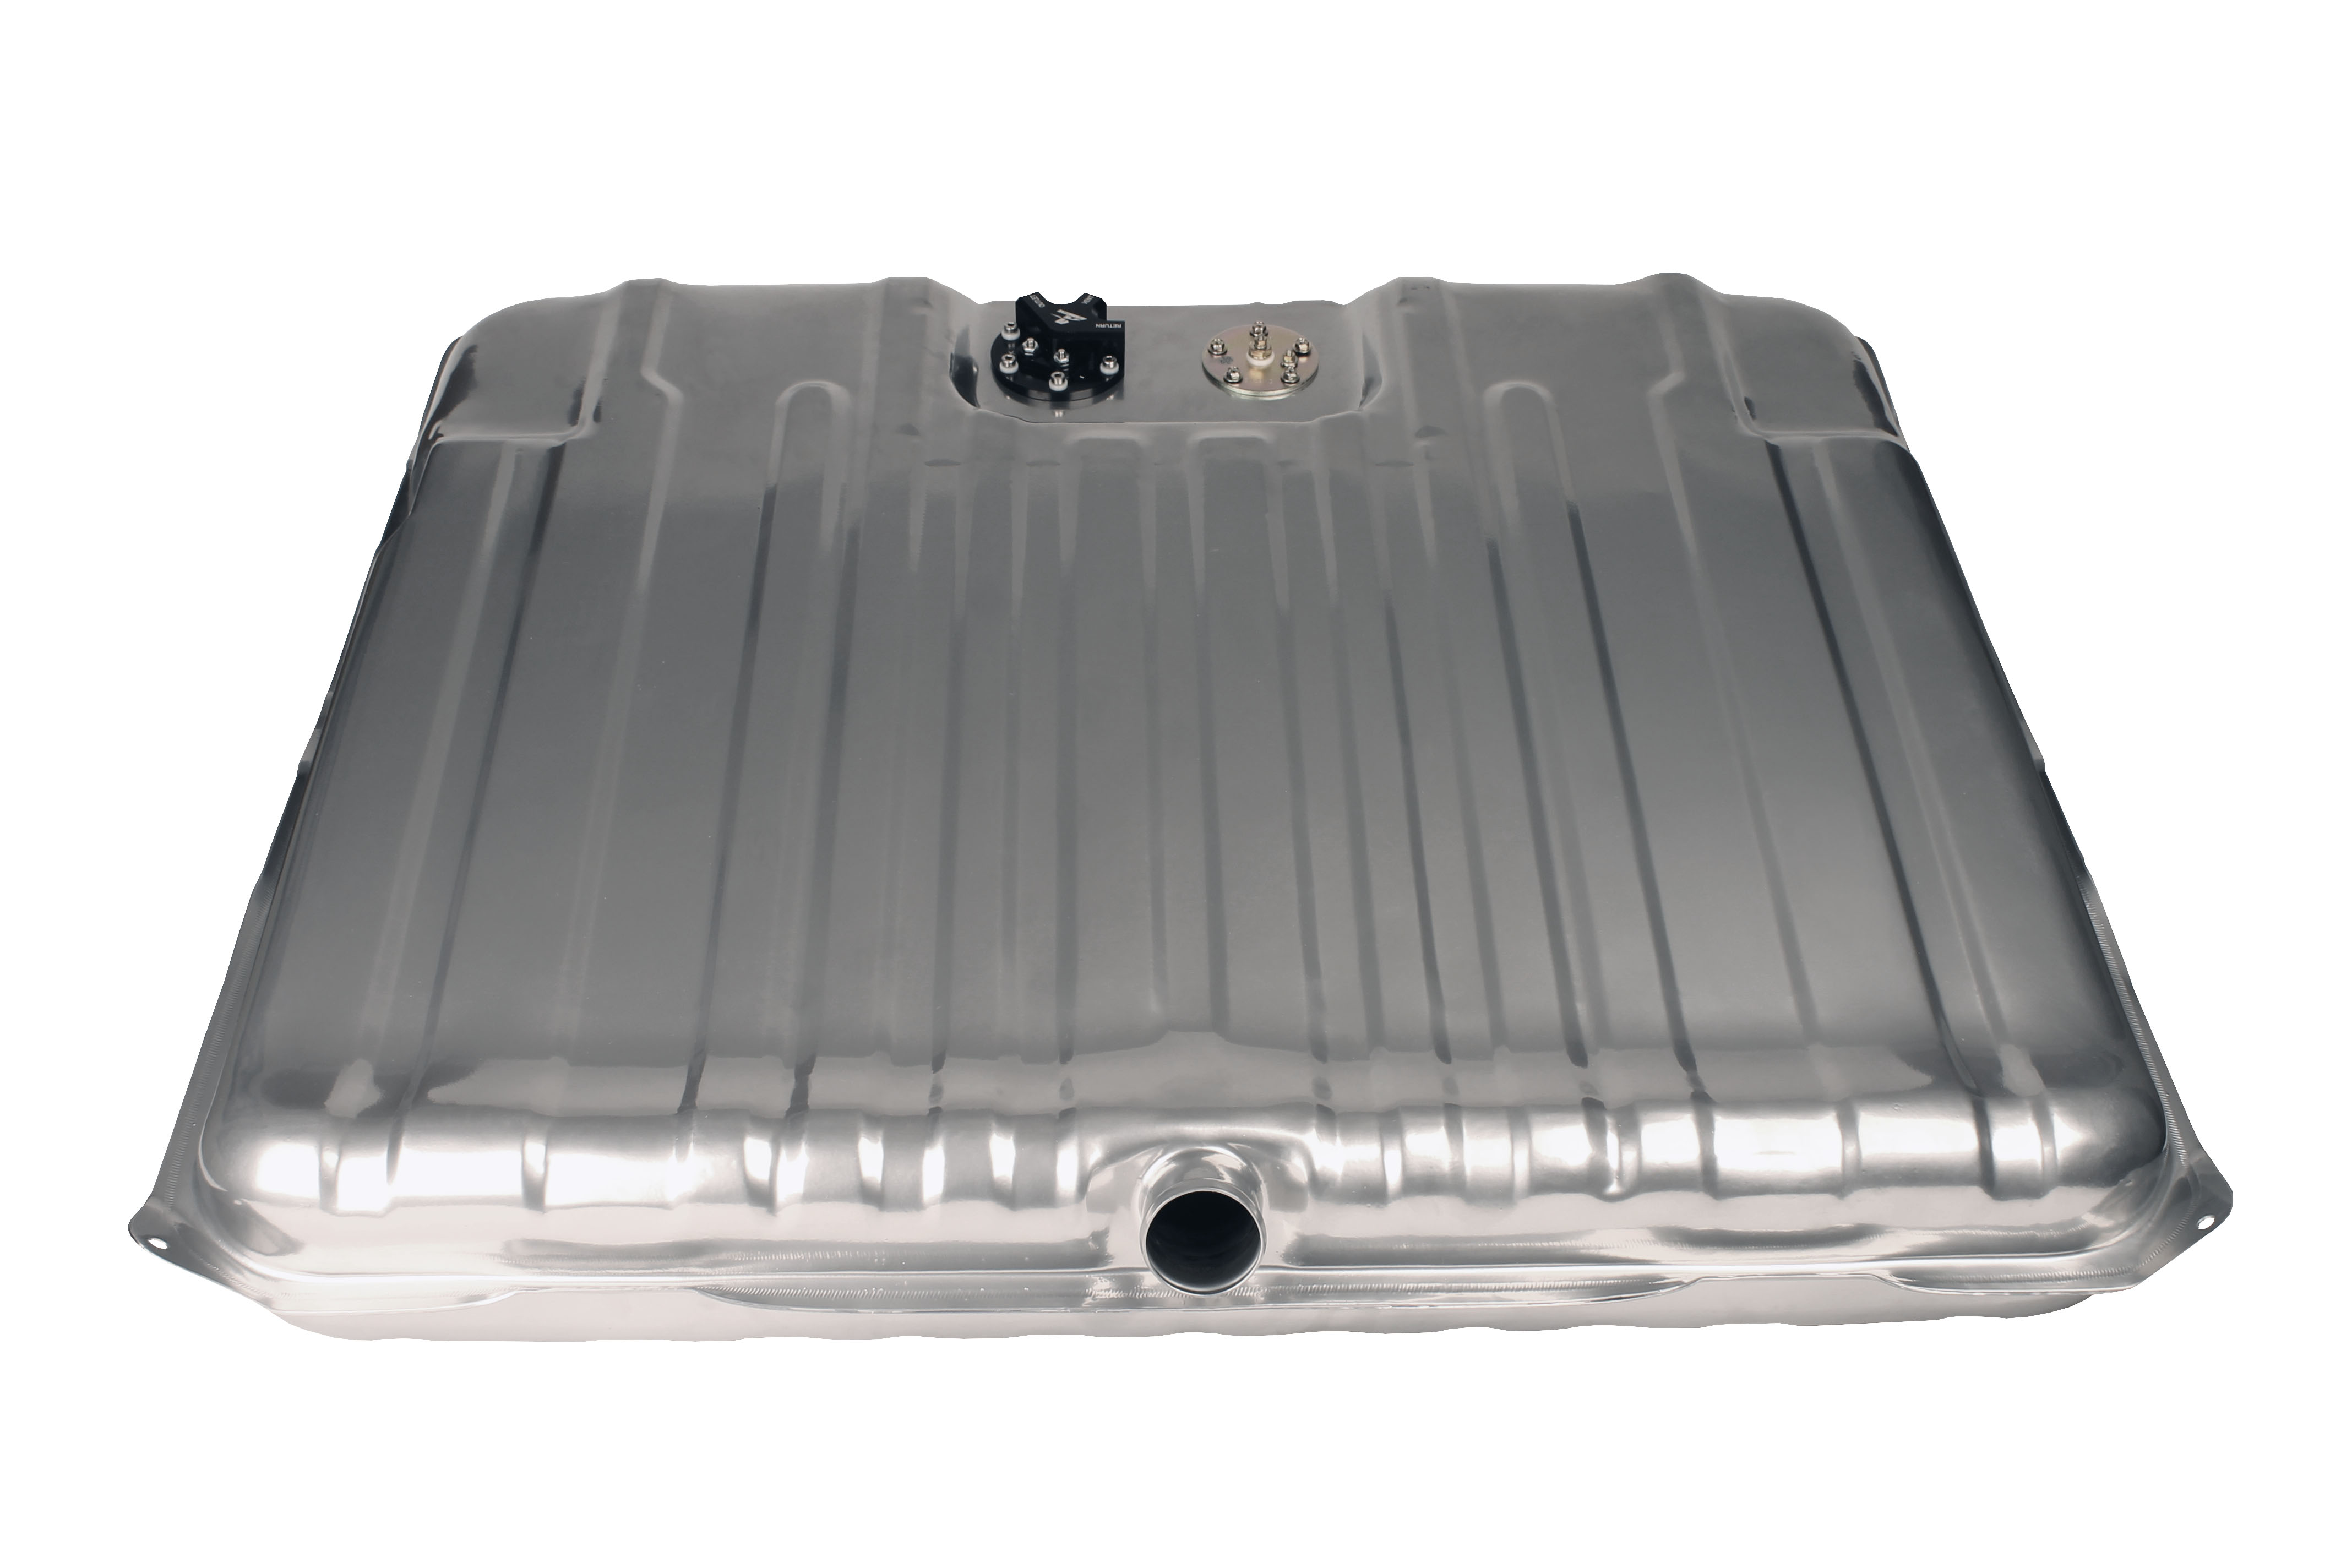 65-67 GTO / LeMans Fuel Tank